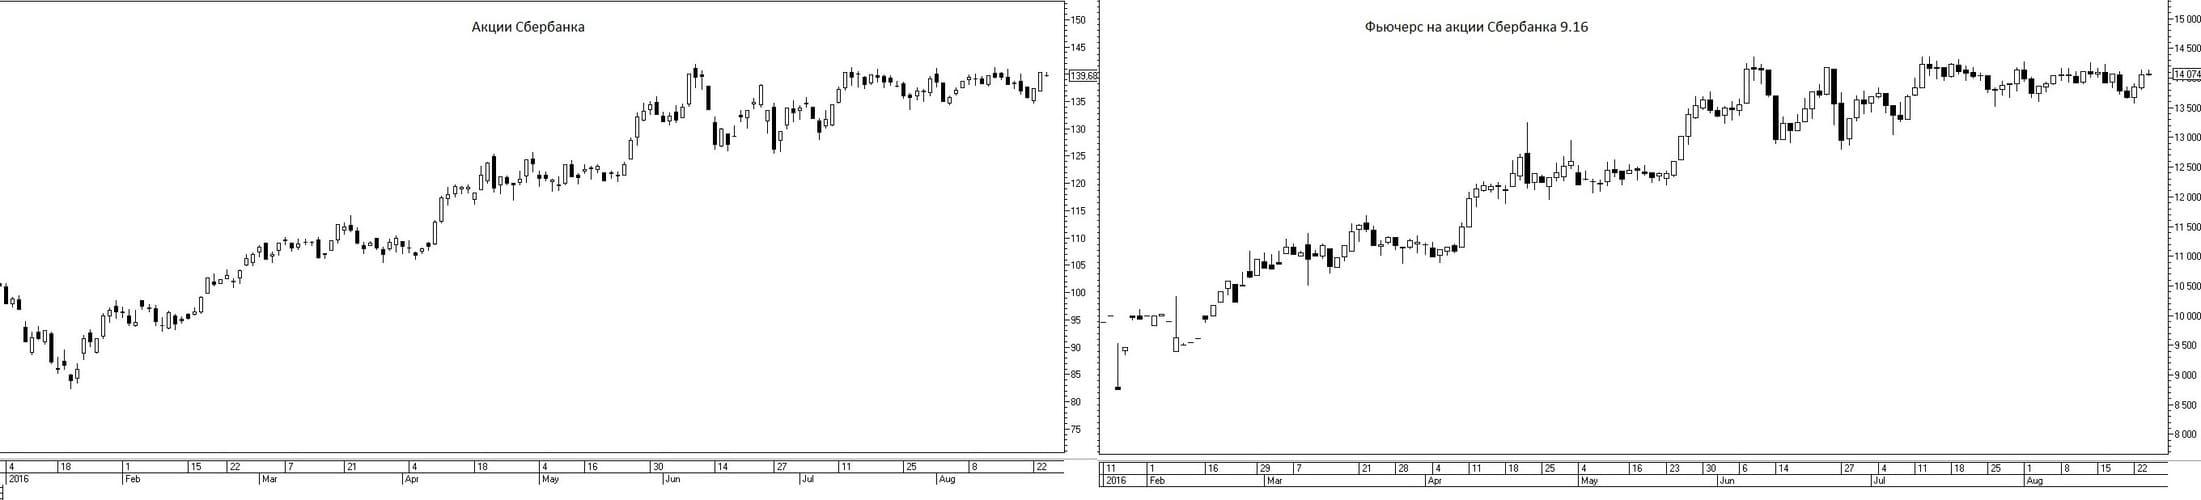 Рис.1. Динамика акций Сбербанка и фьючерса SBRF 9.16